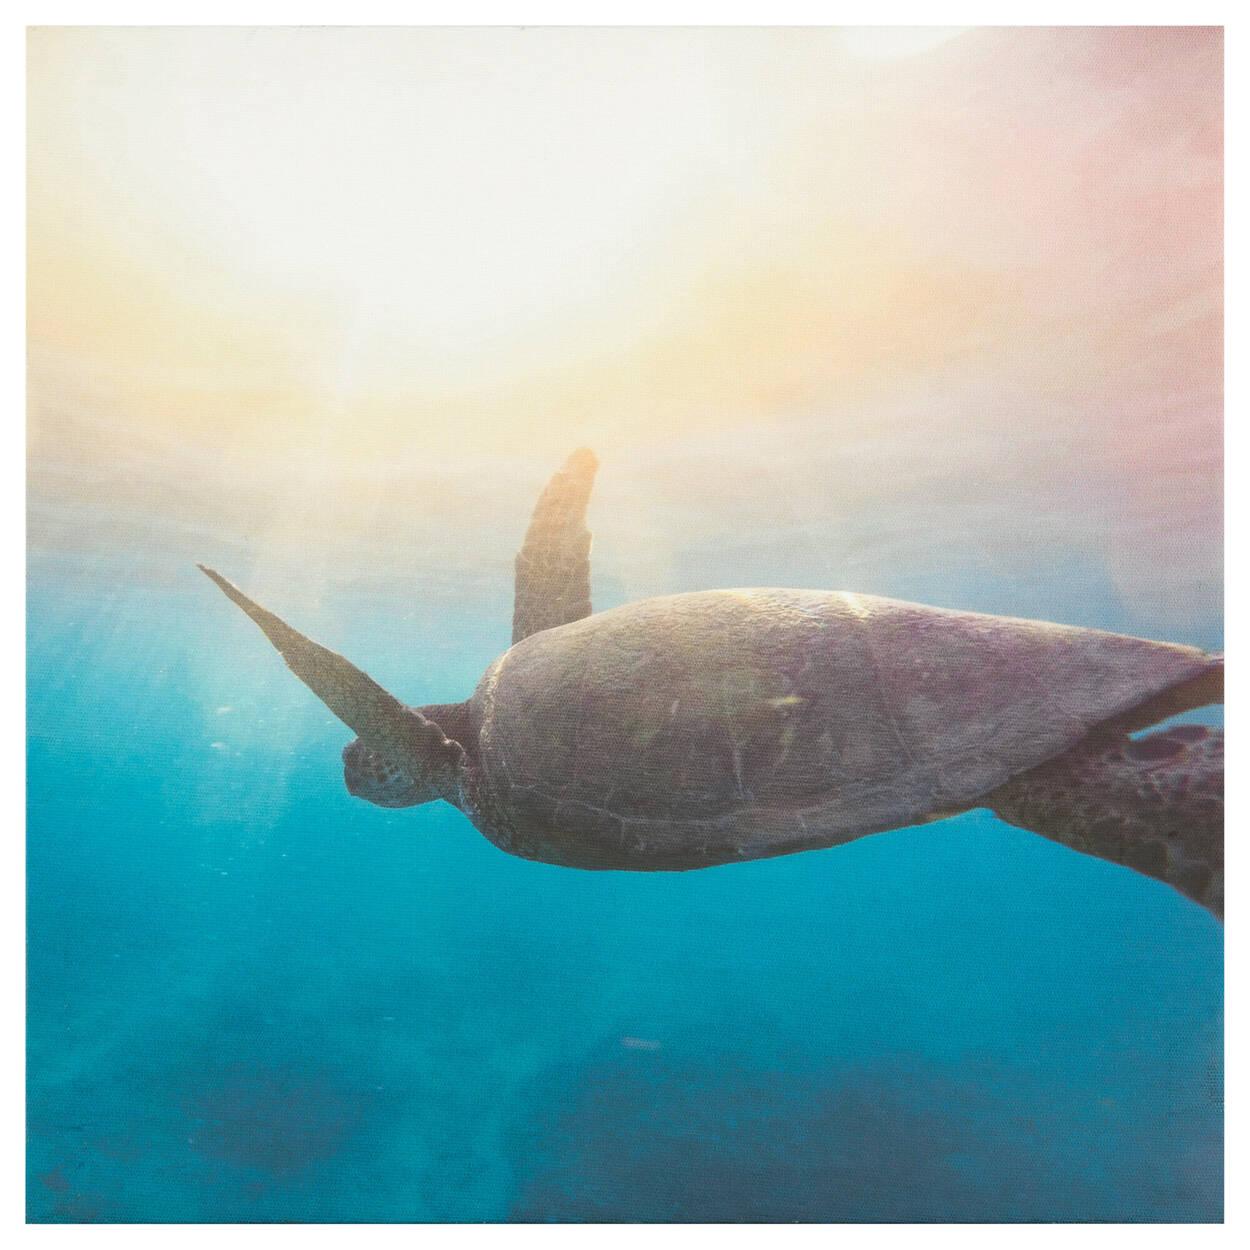 Swimming Sea Turtle Printed Canvas